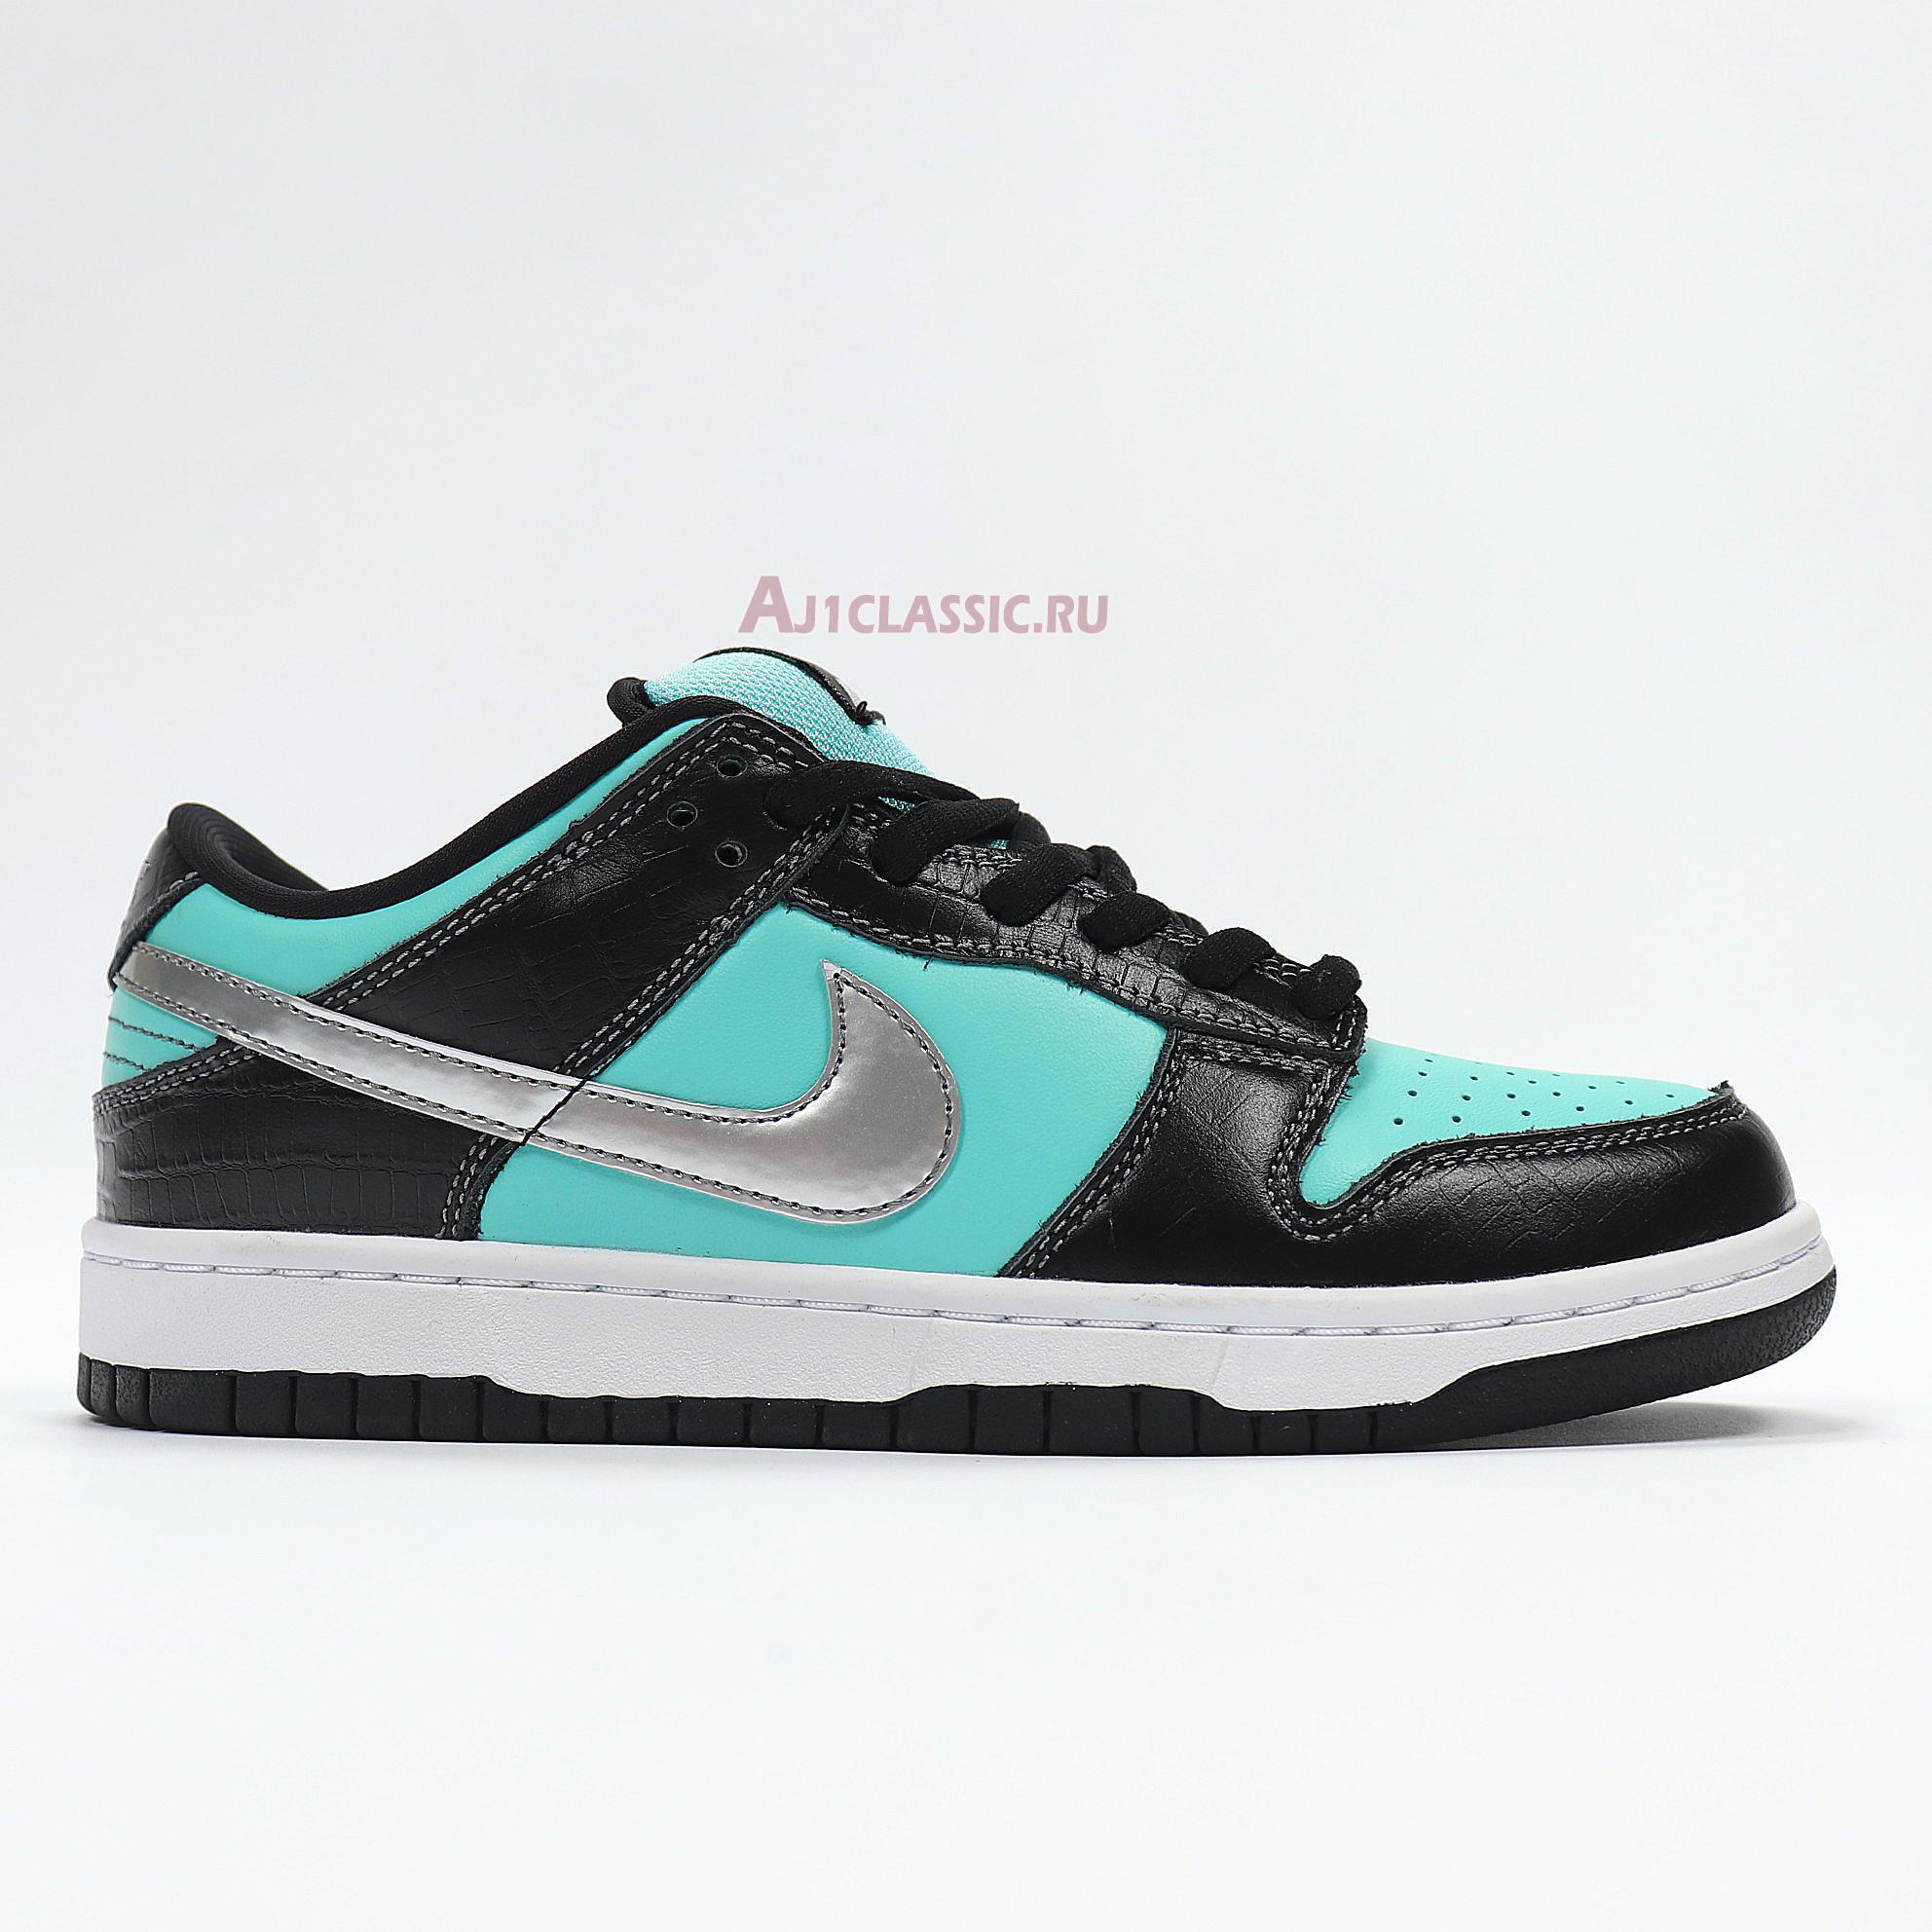 "Nike Diamond Supply Co. x Dunk Low Pro SB ""Tiffany"" 304292-402"